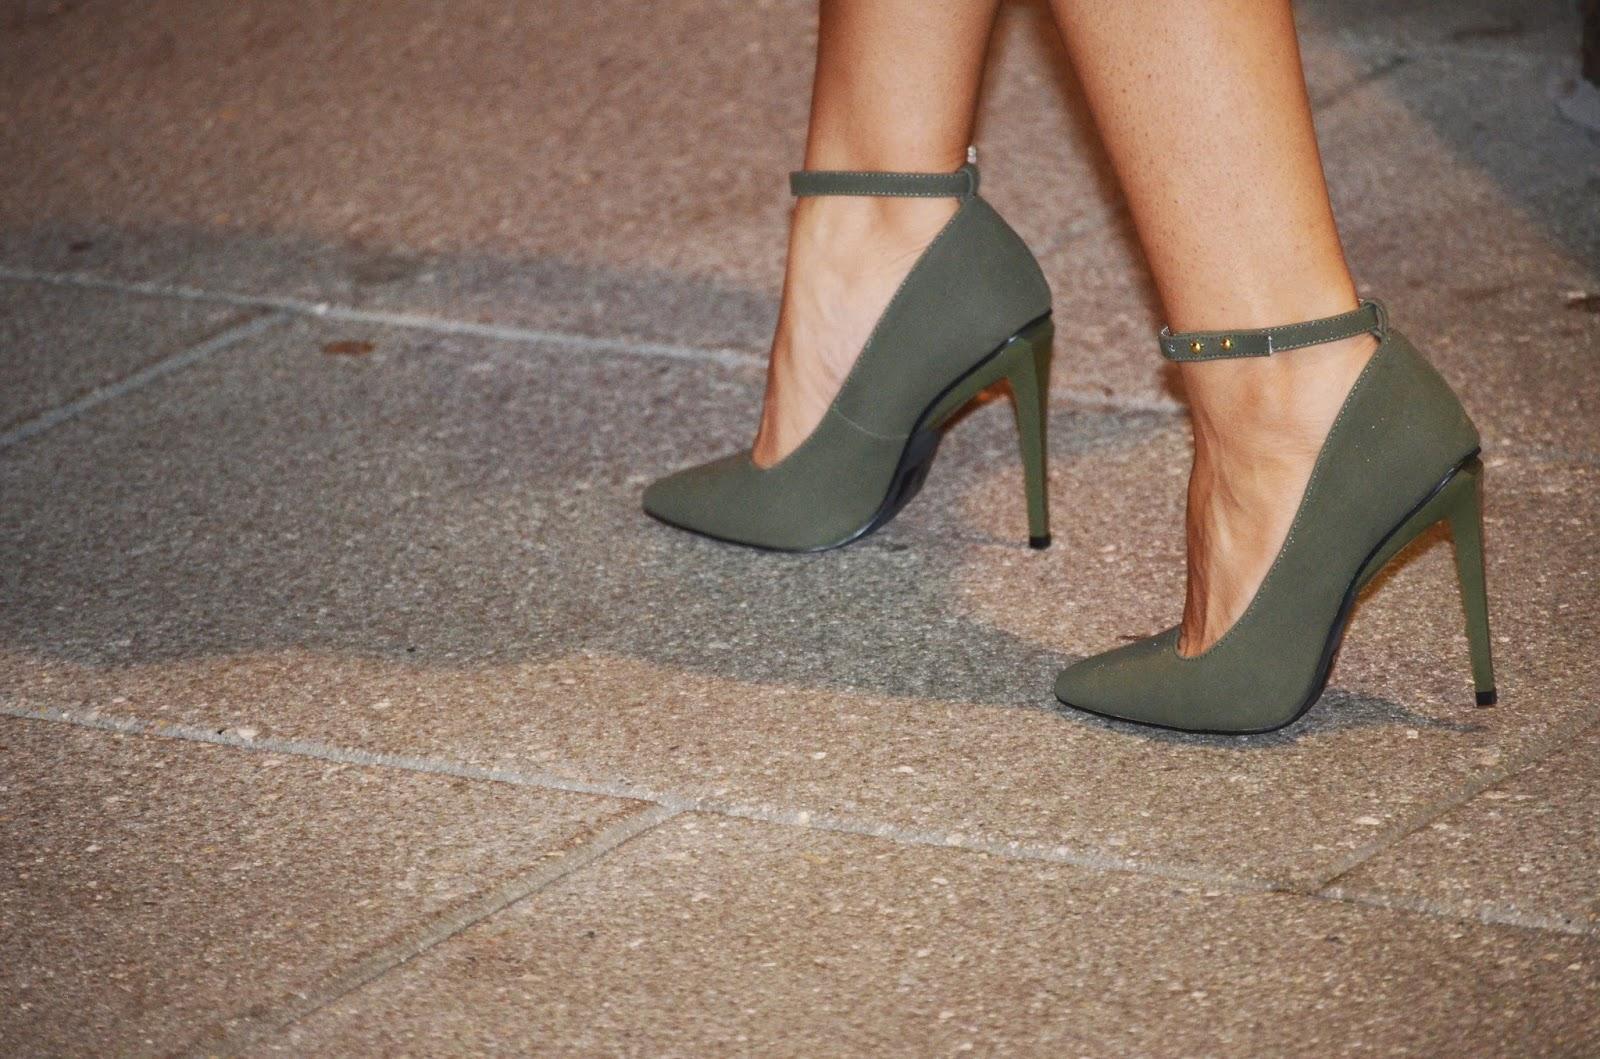 Zapatos Verde Olivo